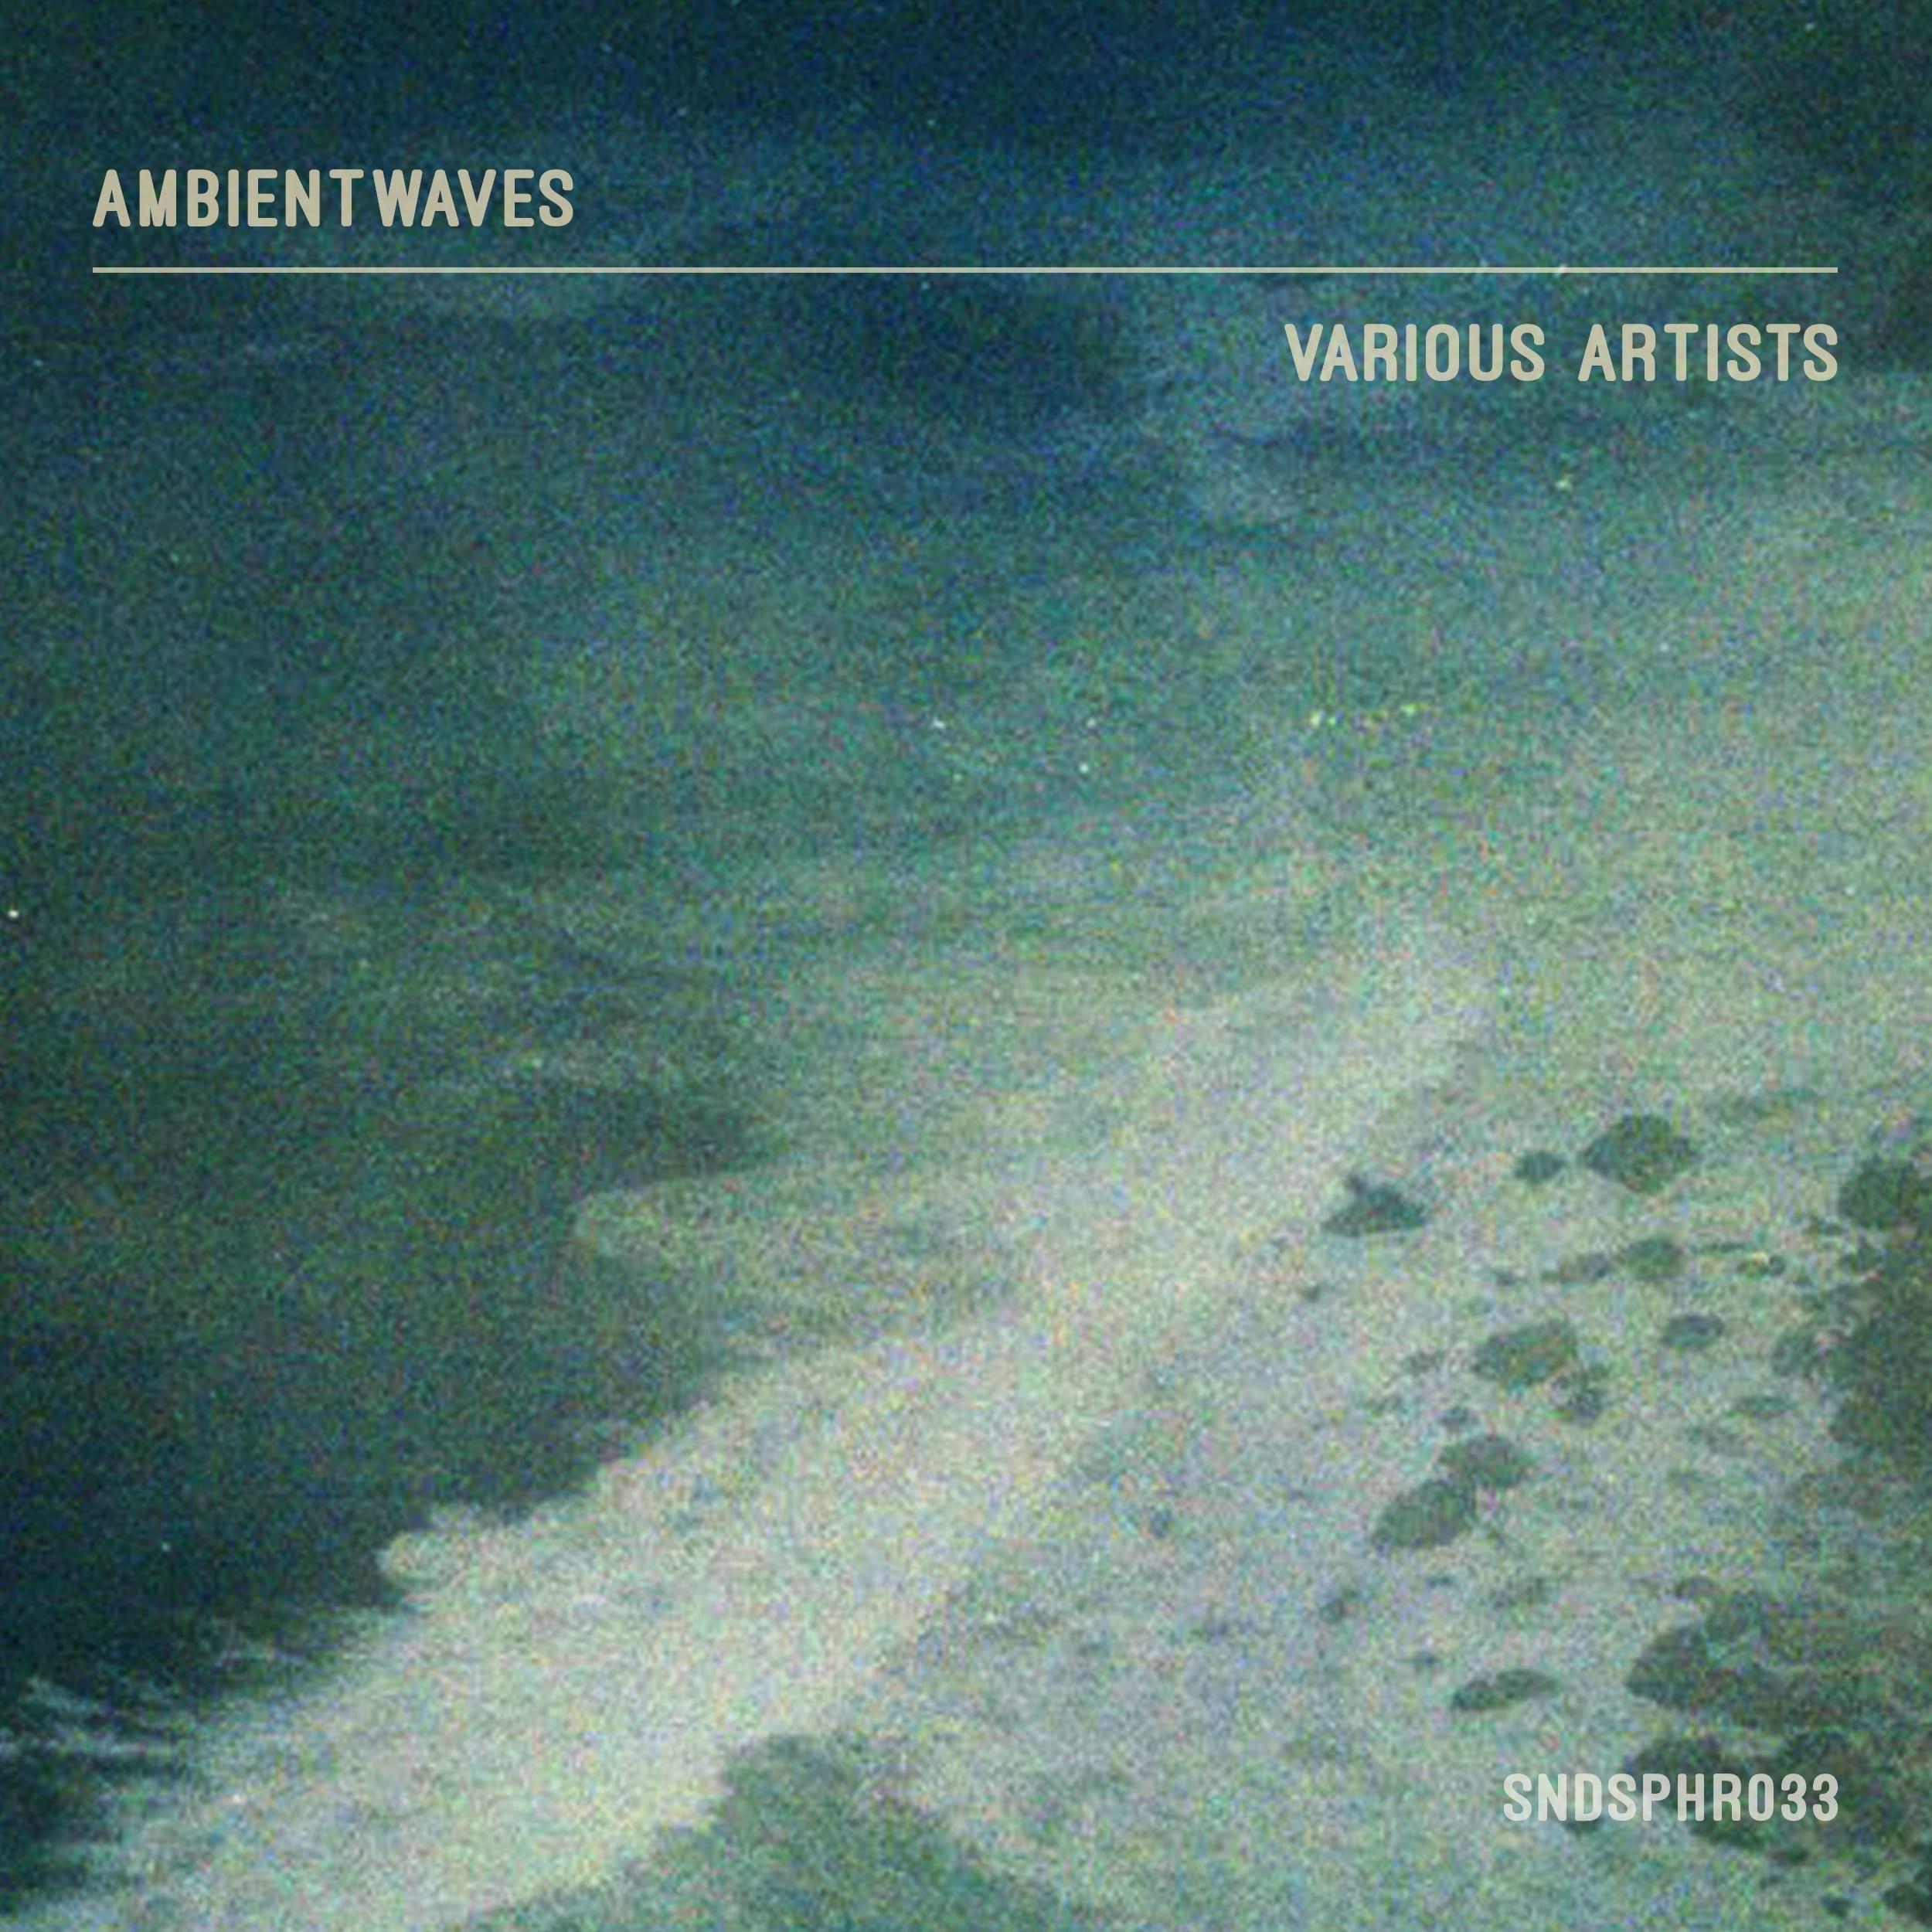 Various Artists - Ambientwaves [Soundsphere]